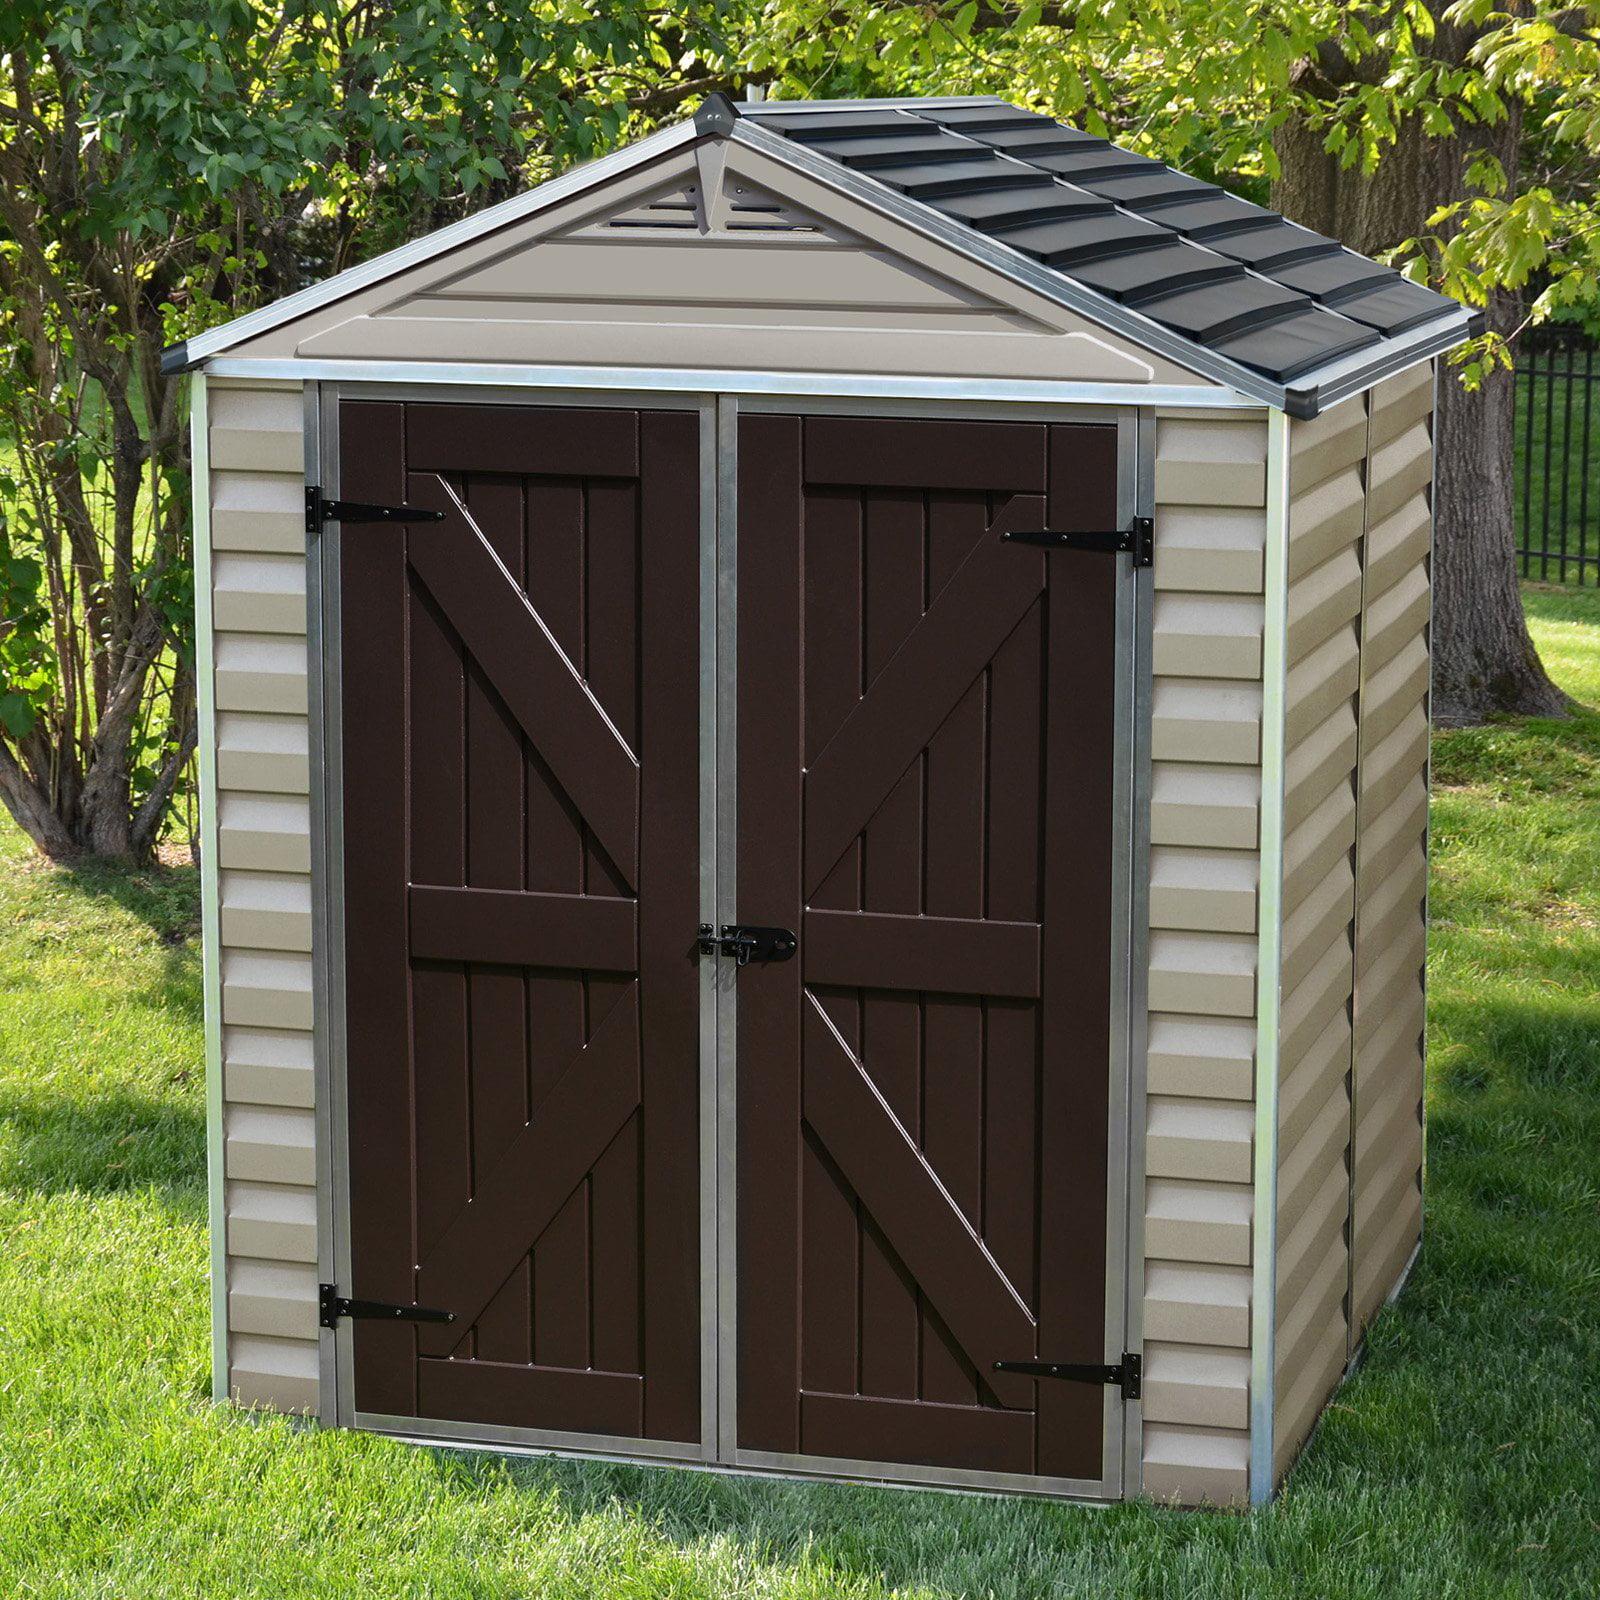 skylight shed kit 6 x 10 tan walmartcom